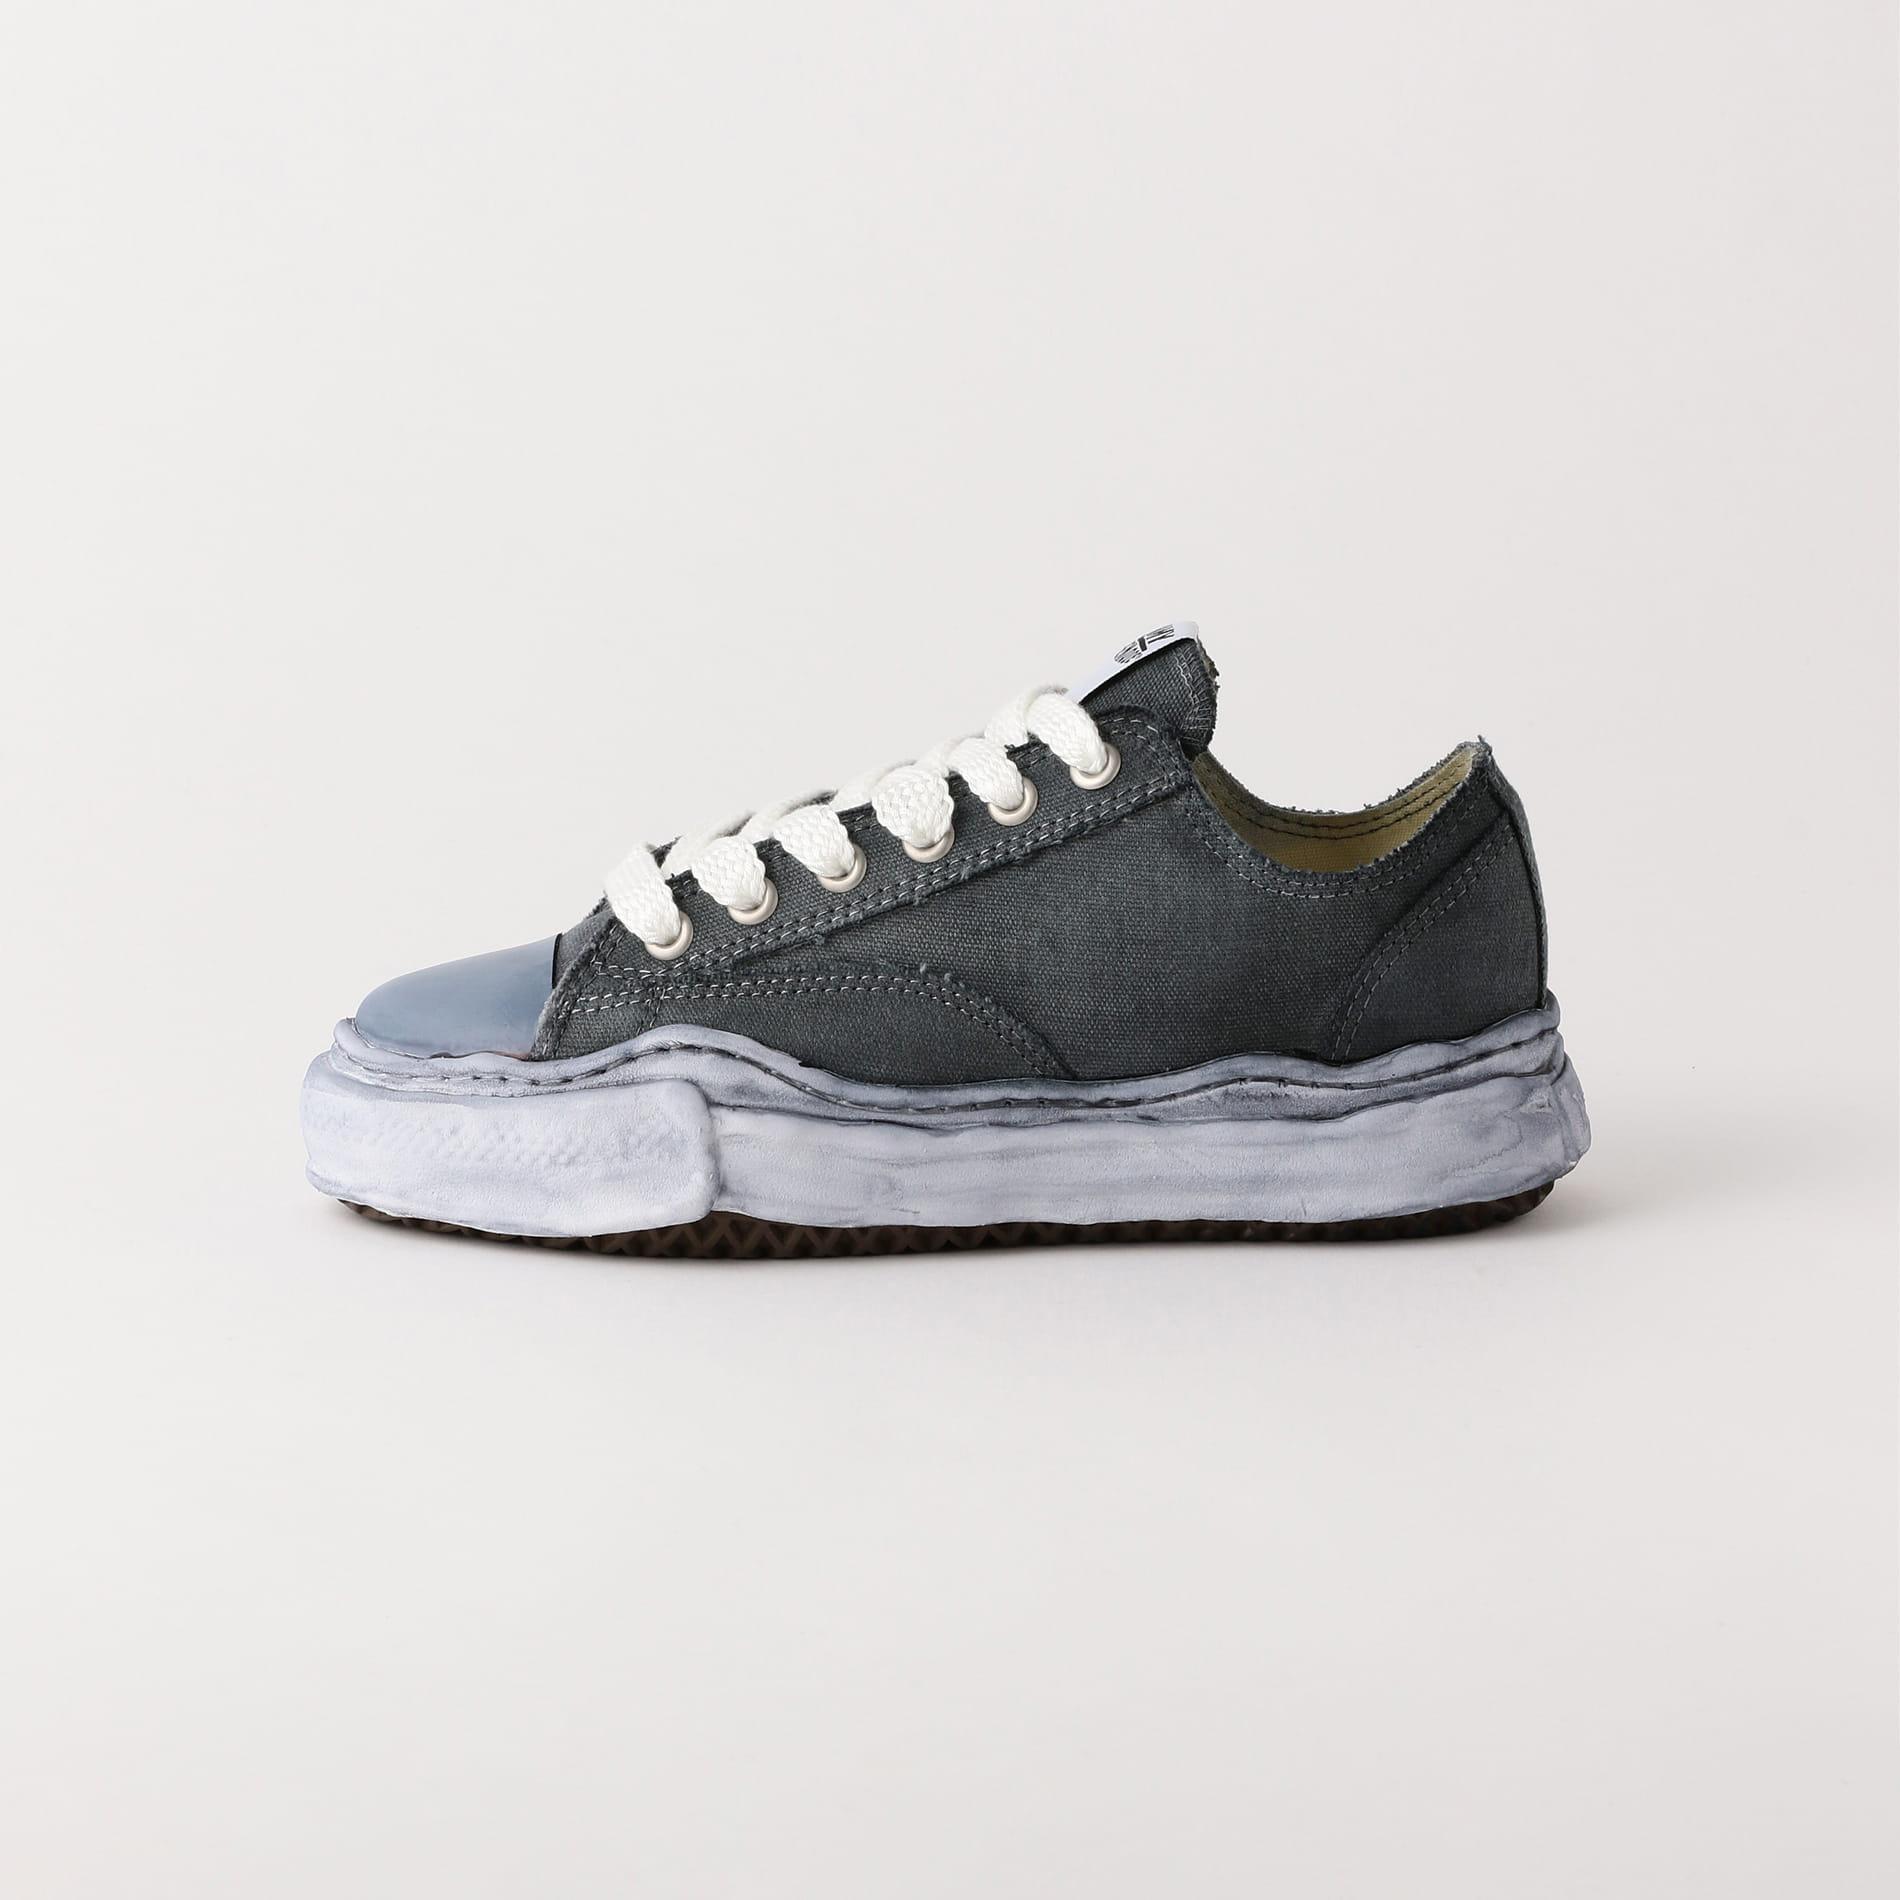 【Maison MIHARA YASUHIRO】MEN Original sole over die lowcut sneaker A04FW710